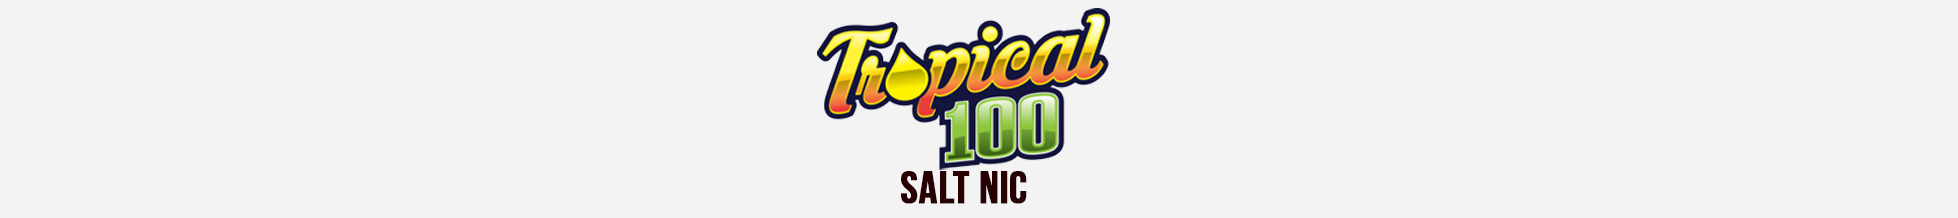 tropical100-salt.jpg